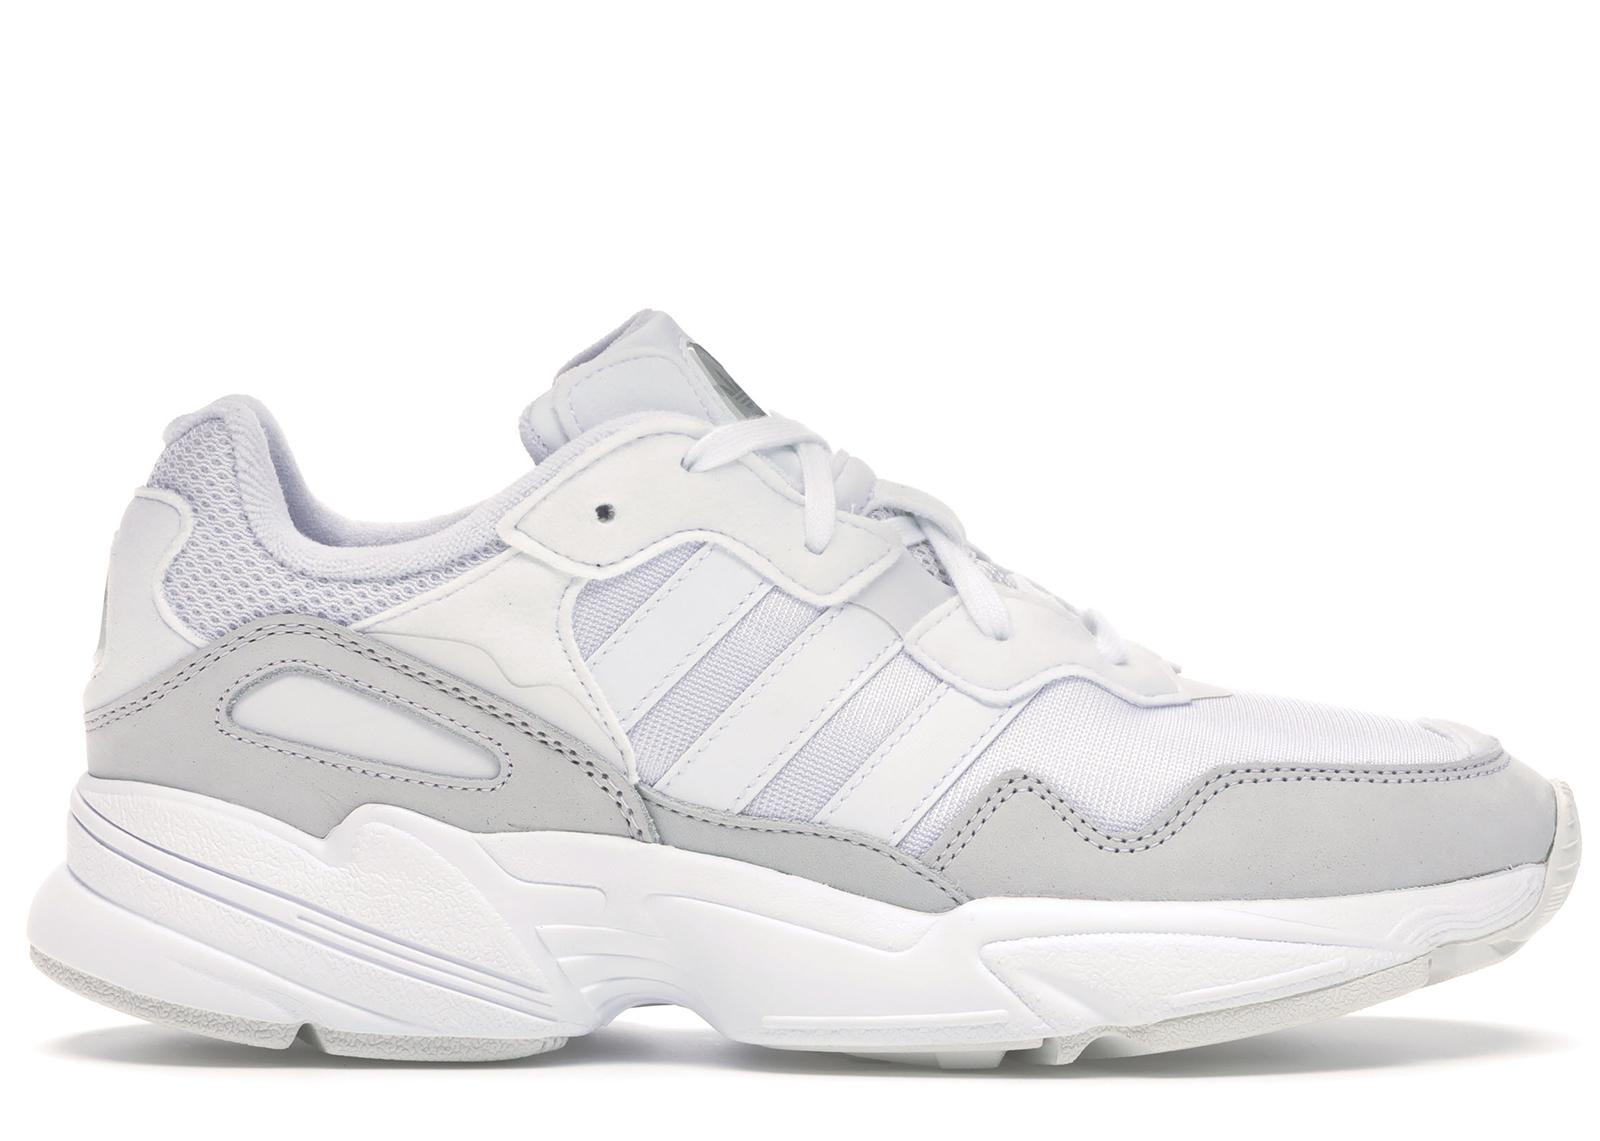 adidas Yung-96 Cloud White Grey One